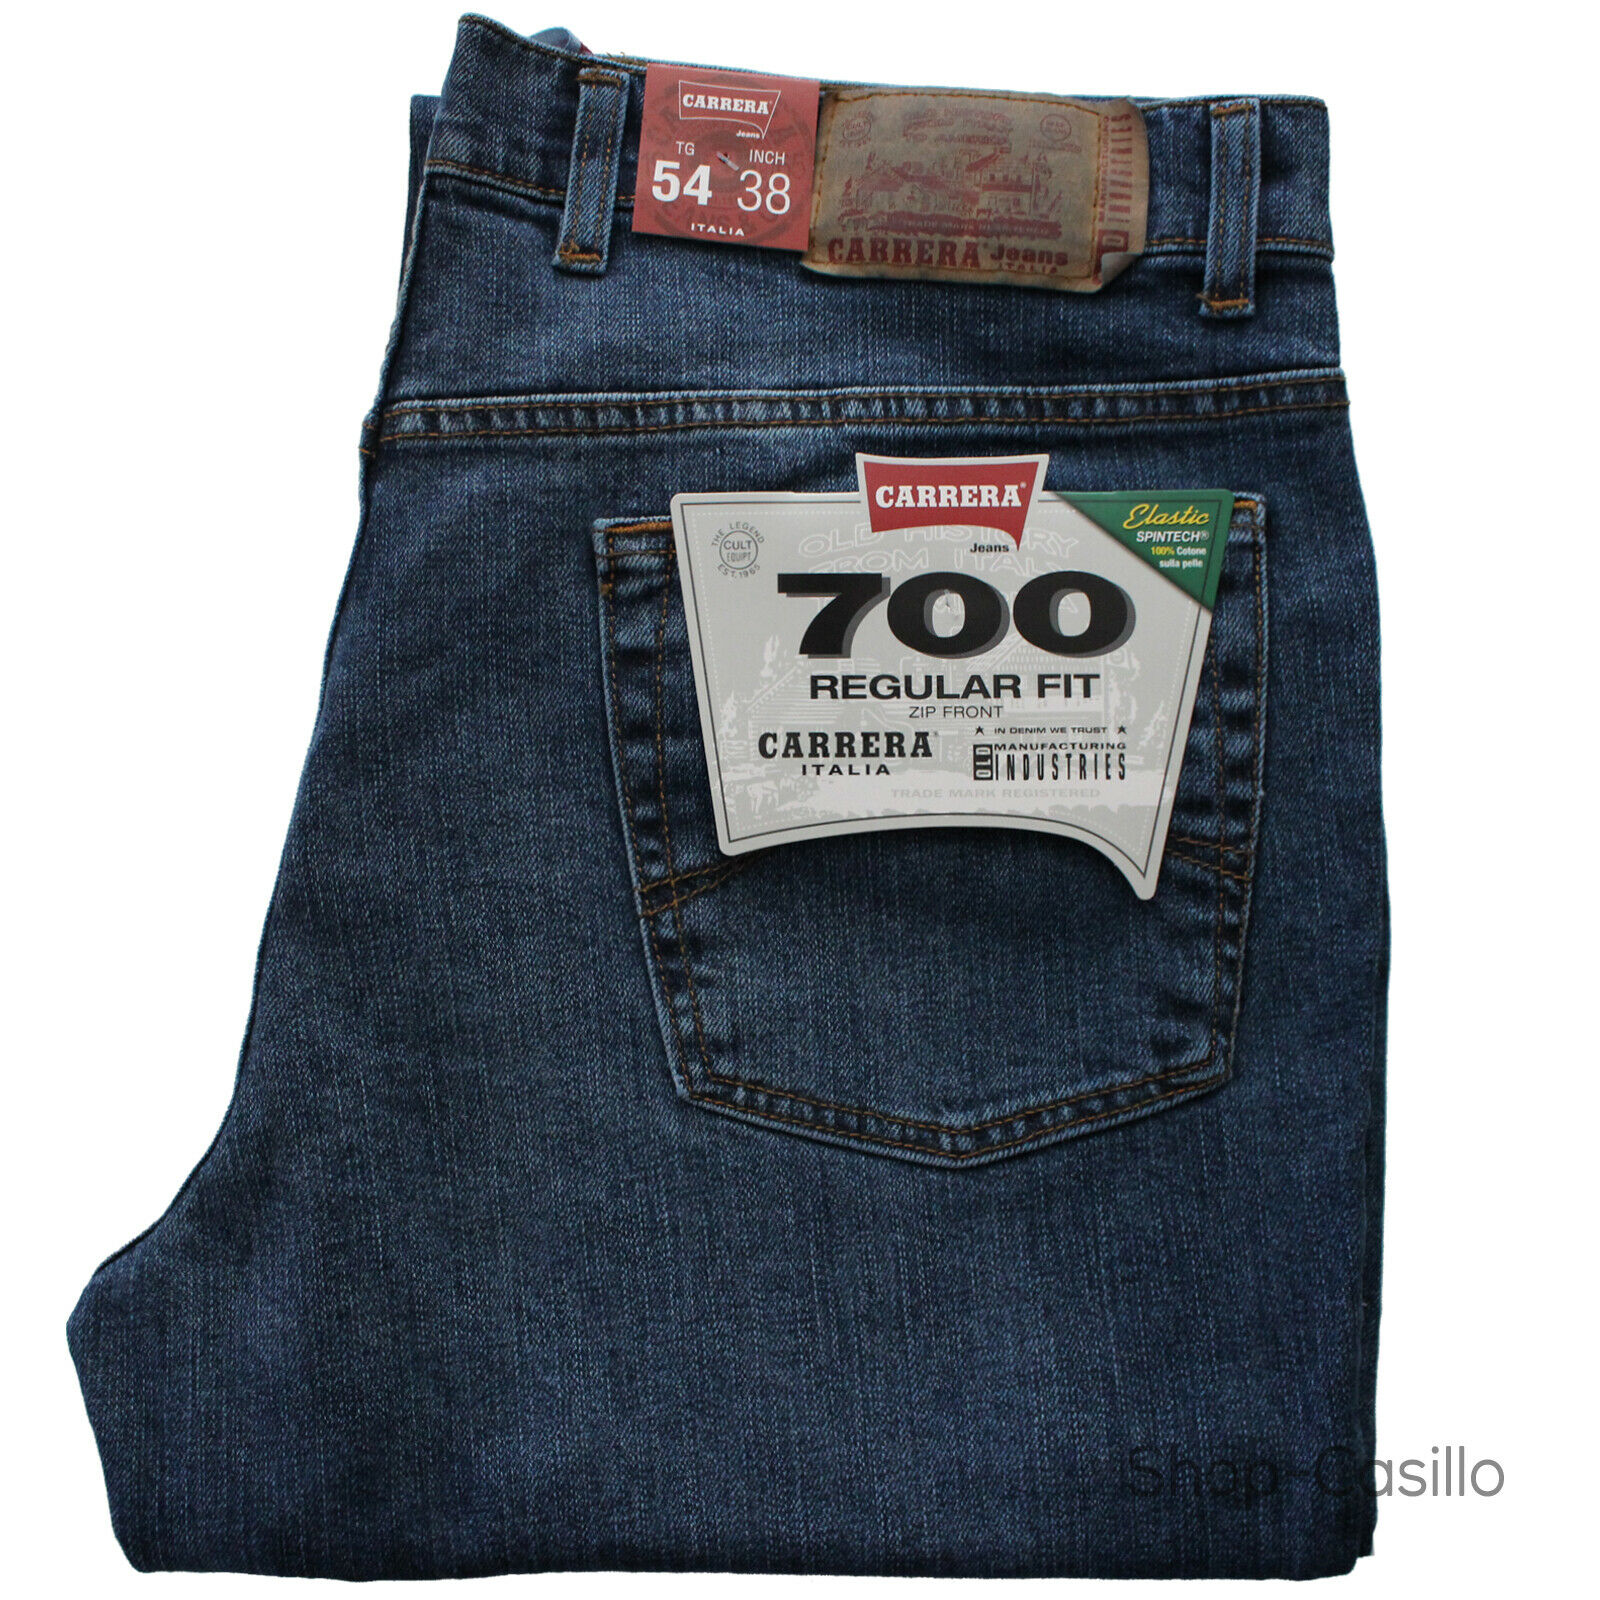 Jeans Carrera 700 Elastico Regular Fit Denim Pantalone Cinque Tasche 46 62 Dritt